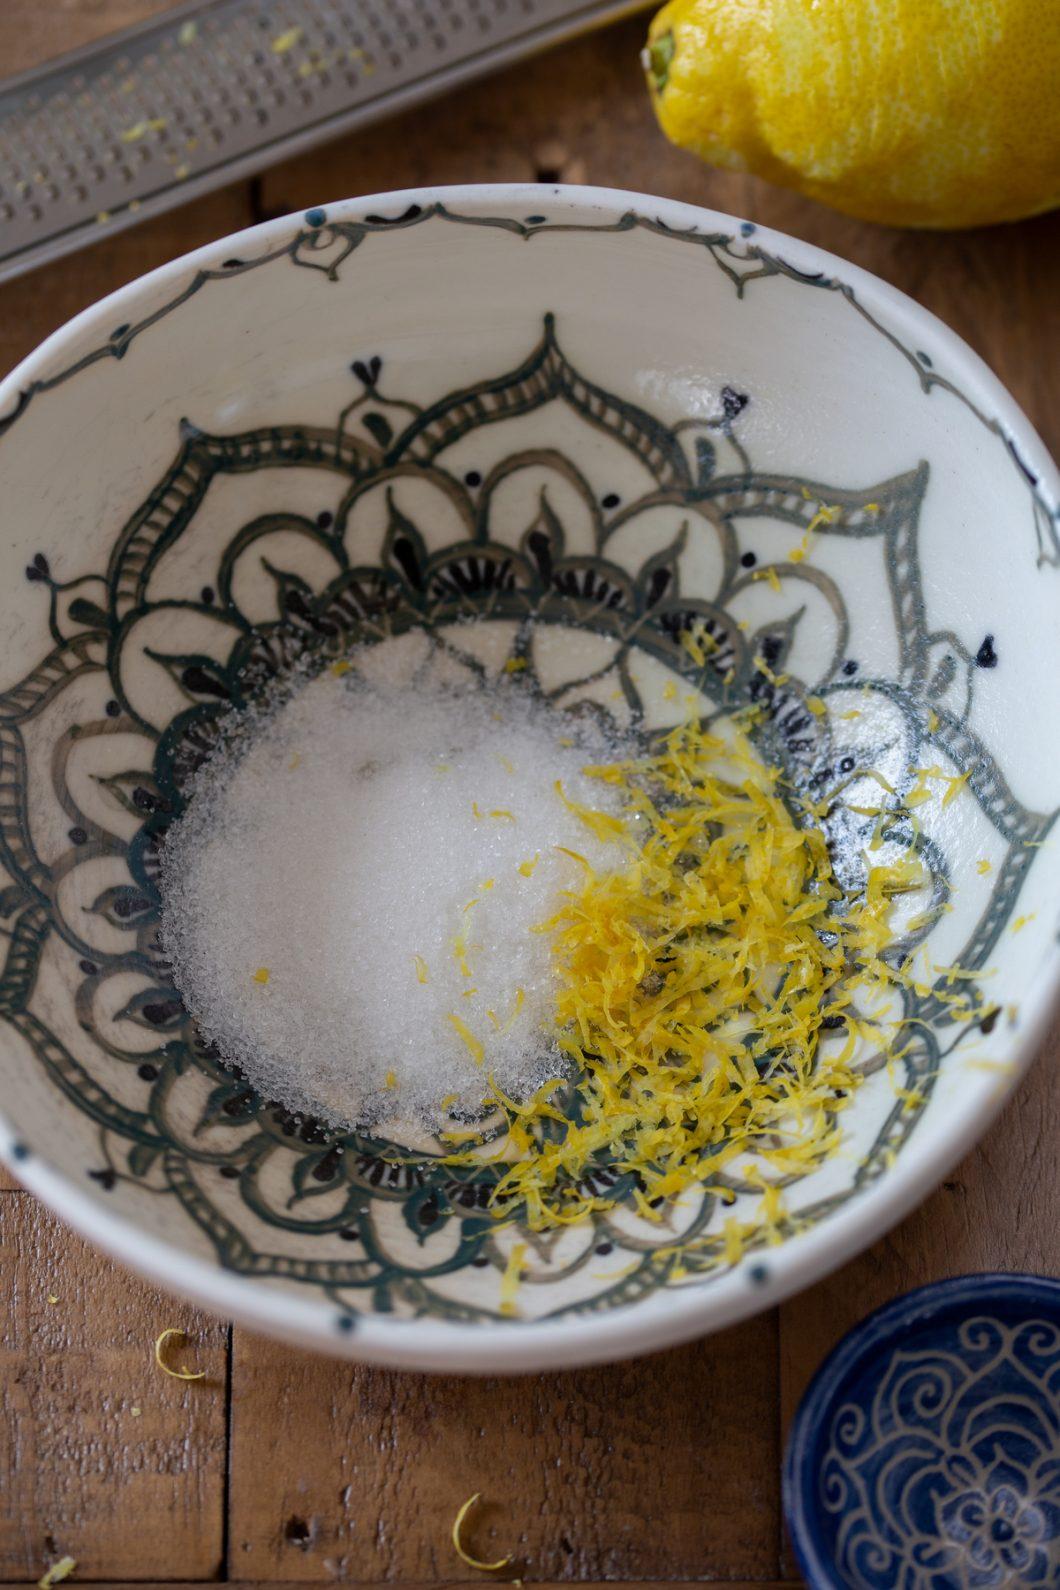 Mandala bowl with granulated sugar and lemon zest.